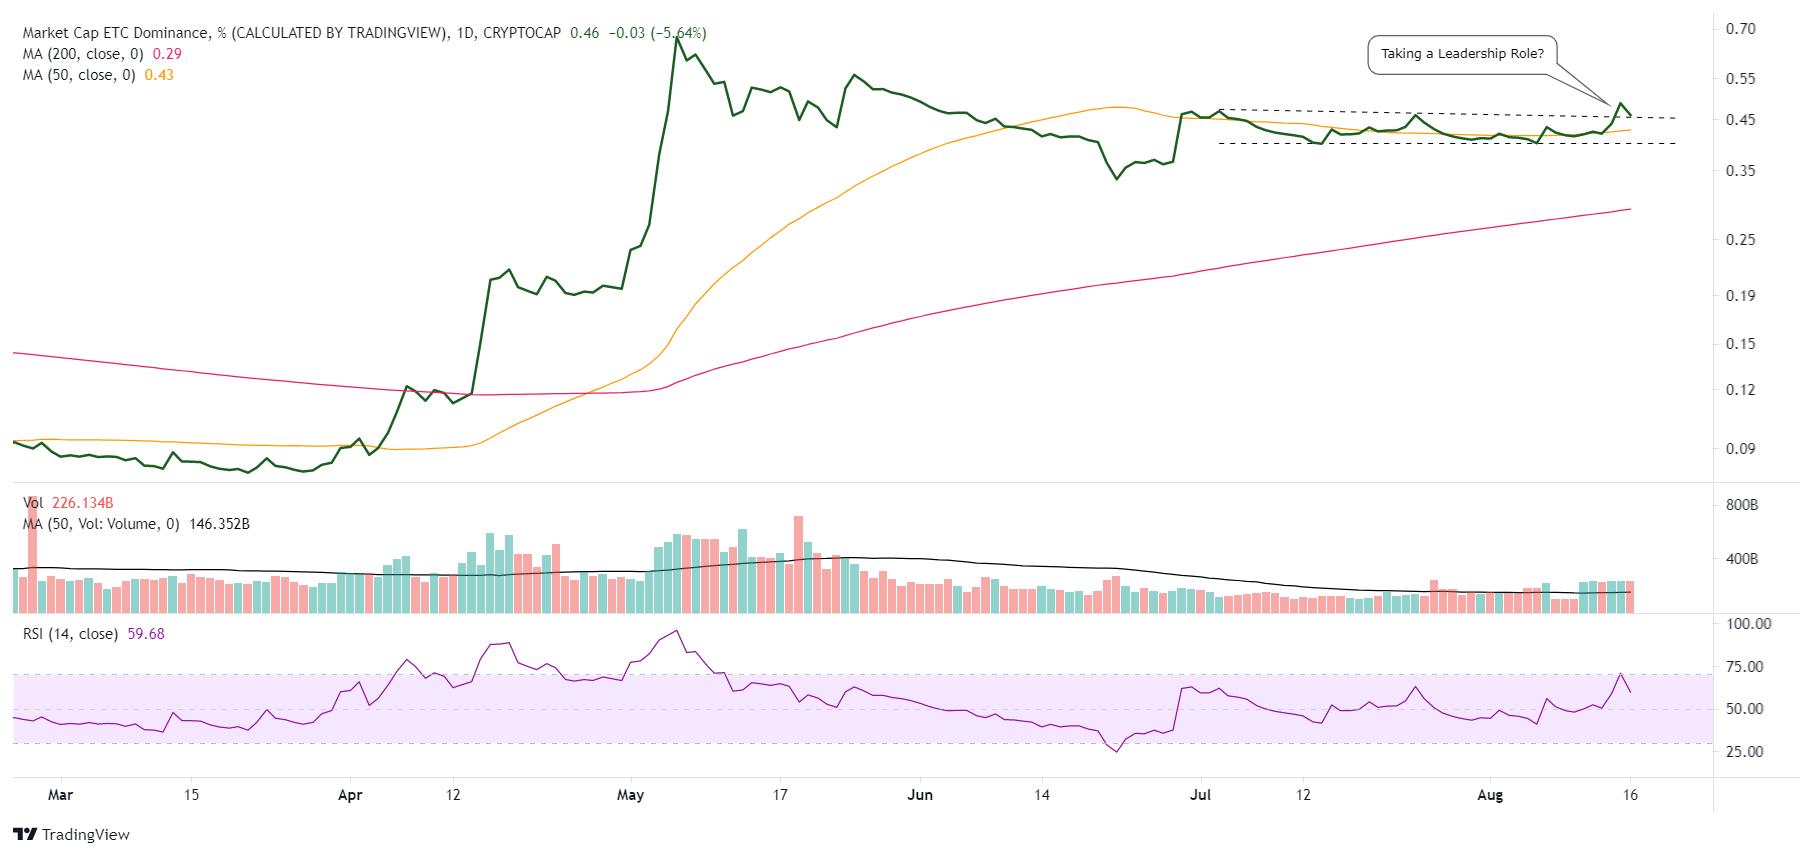 ETC Market Dominance %daily chart